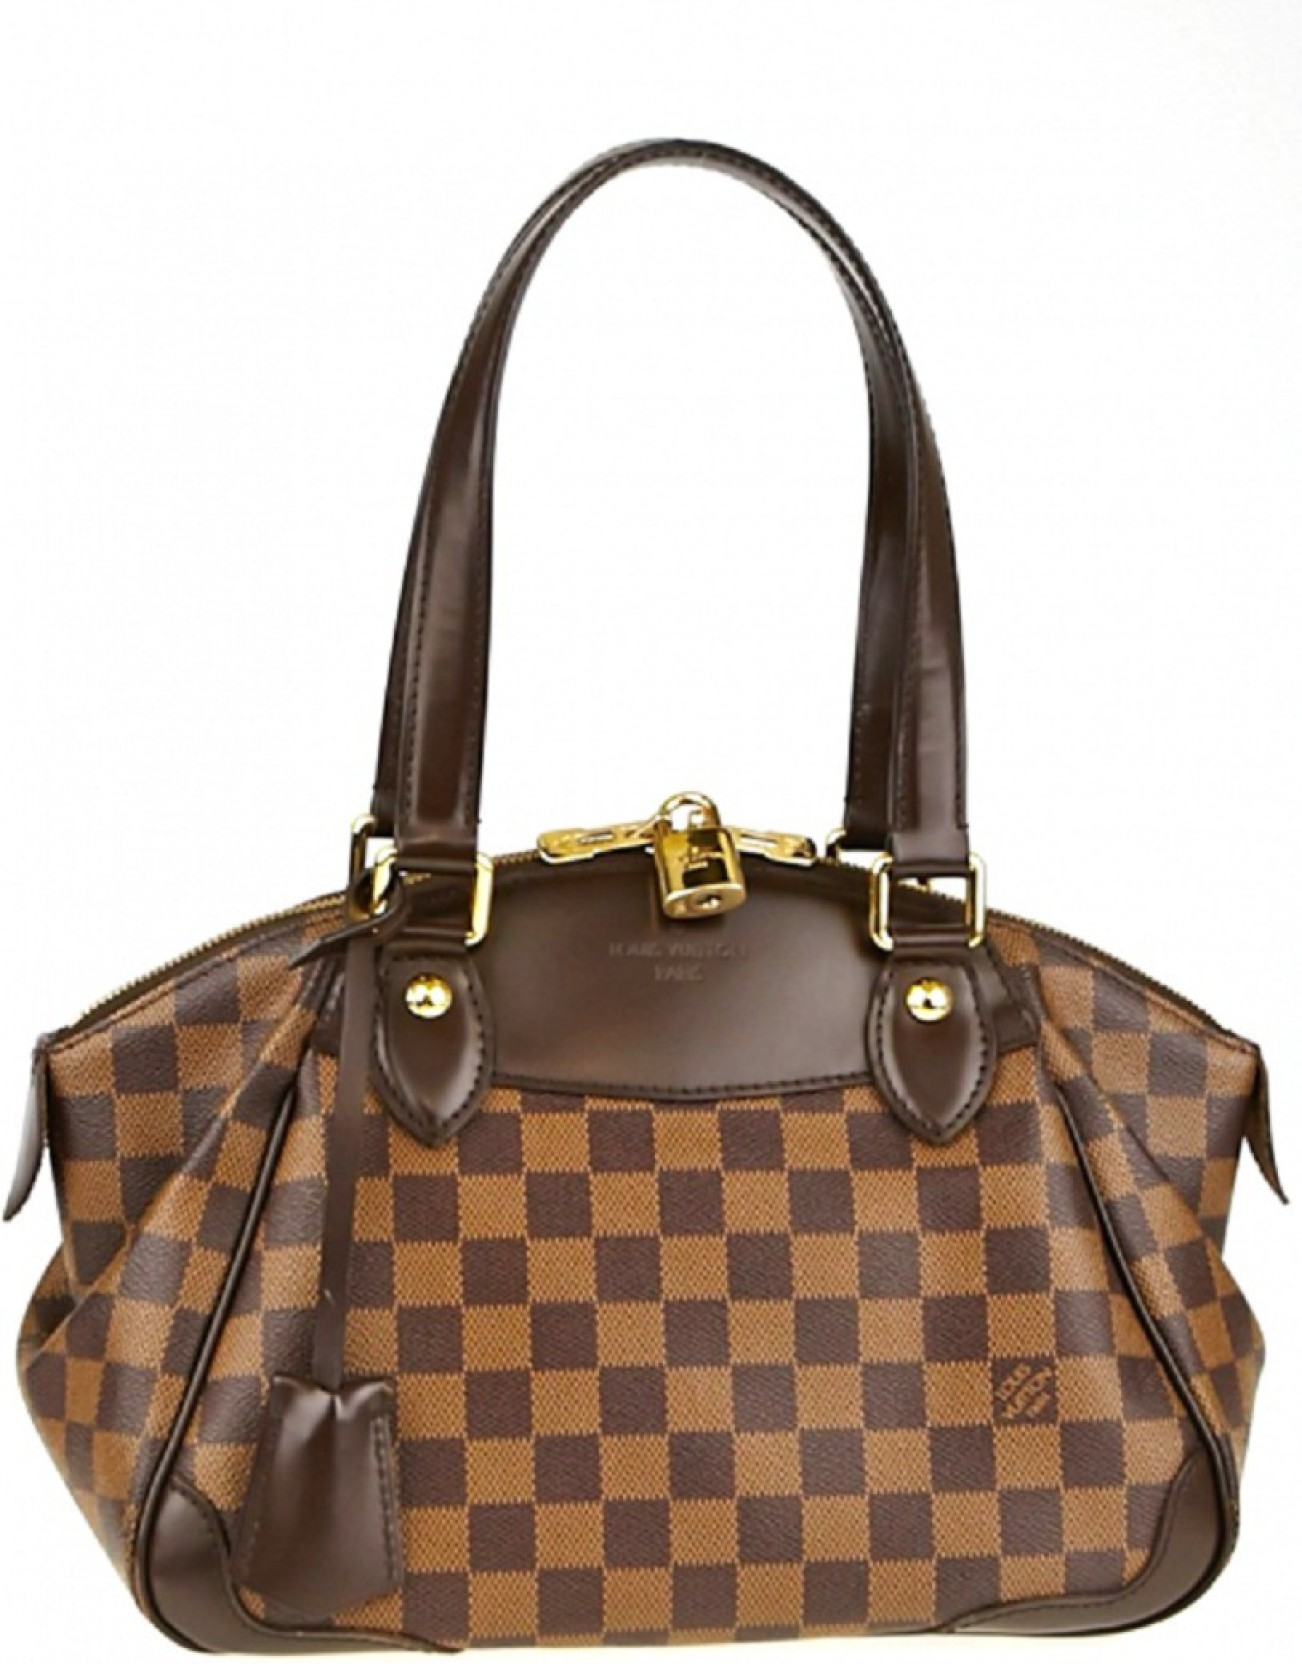 37cb012f461b Louis Vuitton Damier Ebene Verona PM Waterproof Shoulder Bag (Brown